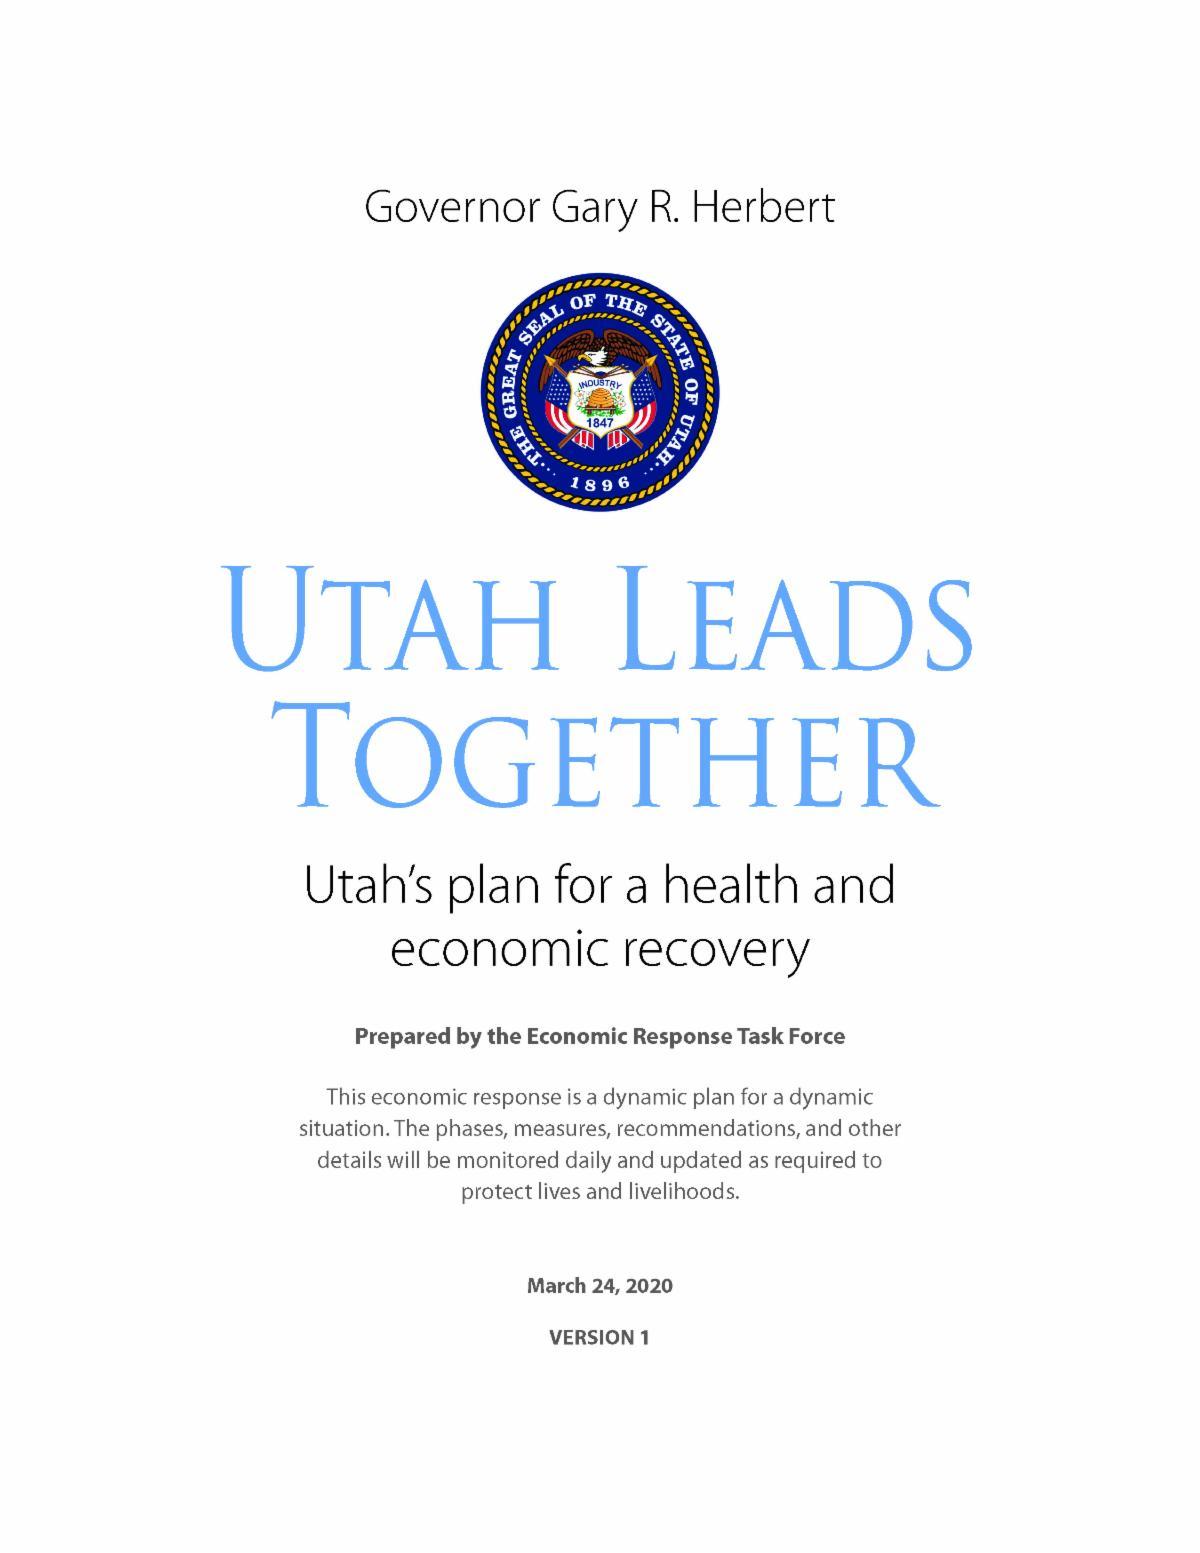 Utah Leads Together